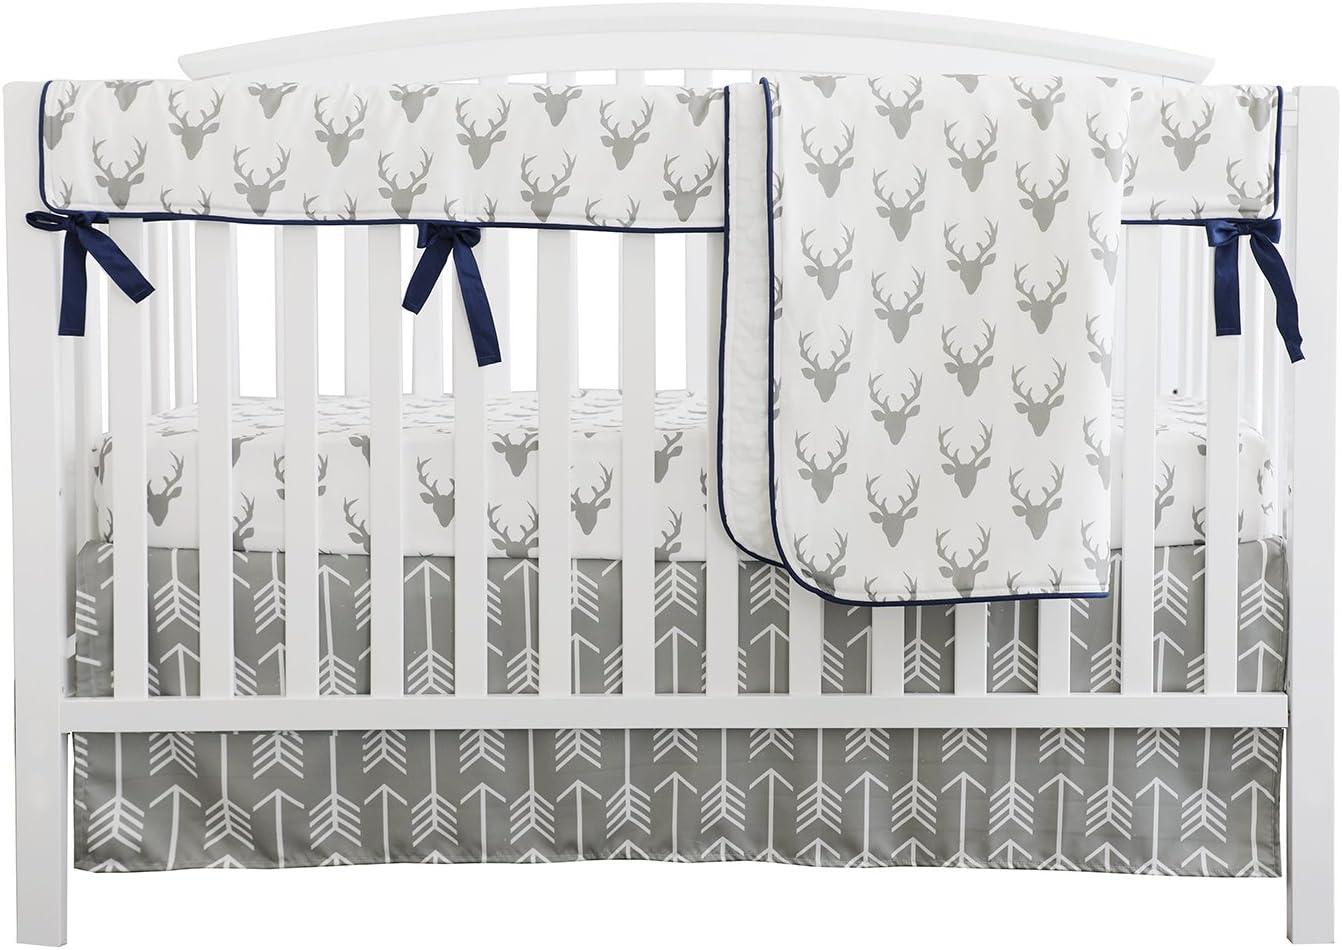 Deer Sheets - Woodland  Linen Buck Cotton Sateen Sheet Set Bedding by Spoonflower Antlers On Navy Linen by littlearrowdesign jumbo Scale